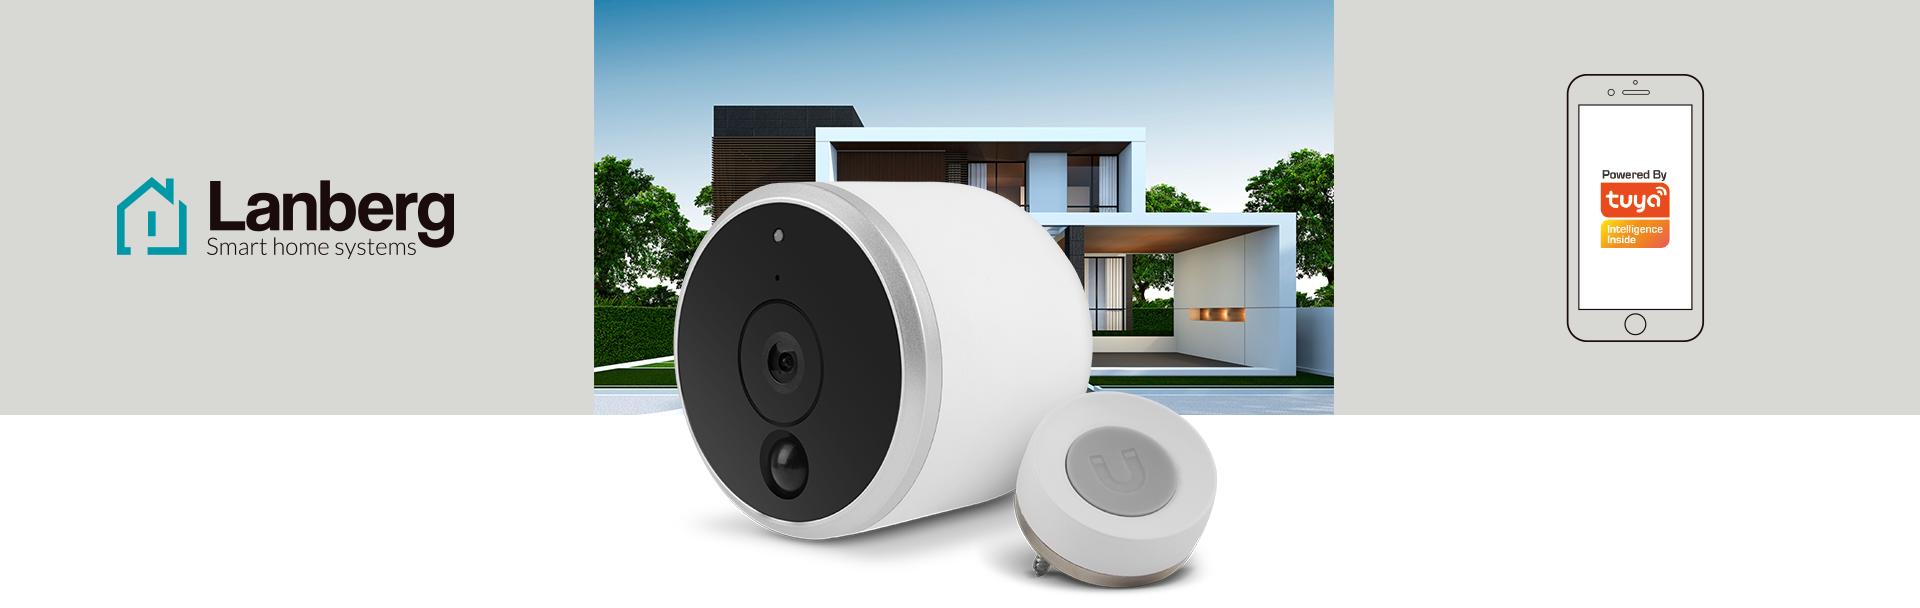 LANBERG Smart Home Kamera IP - ceny i opinie w Media Expert